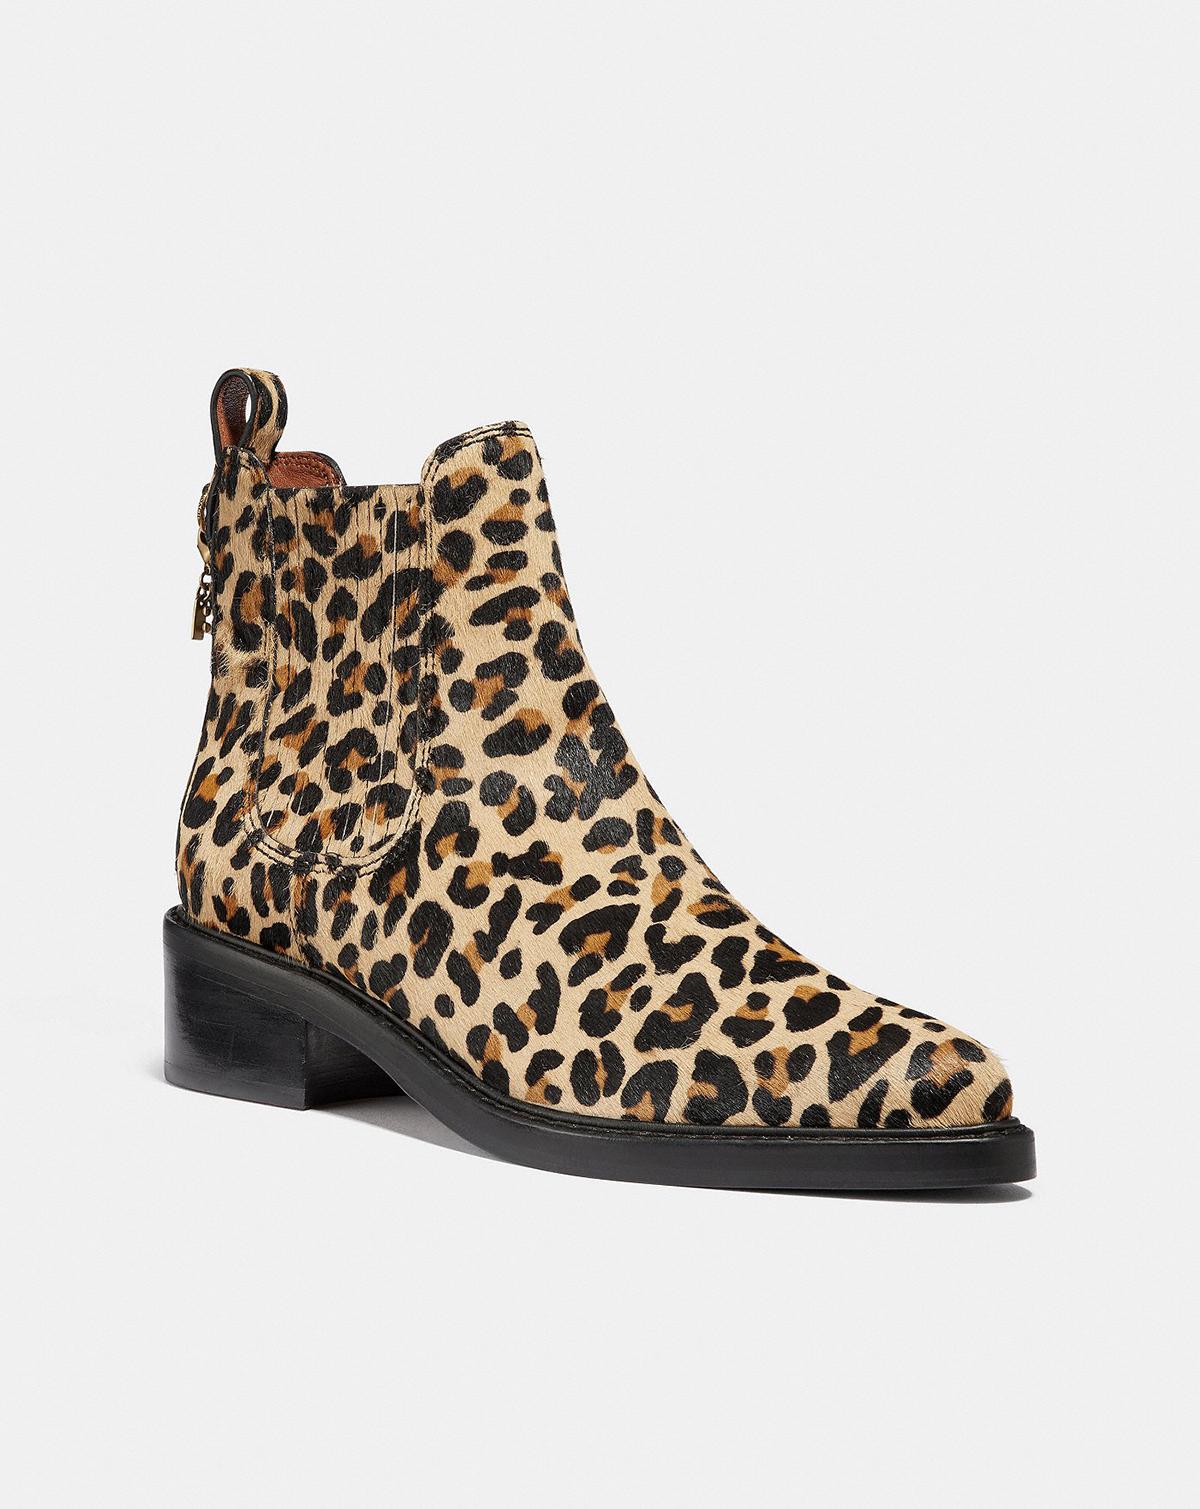 Coach Leopard Boots